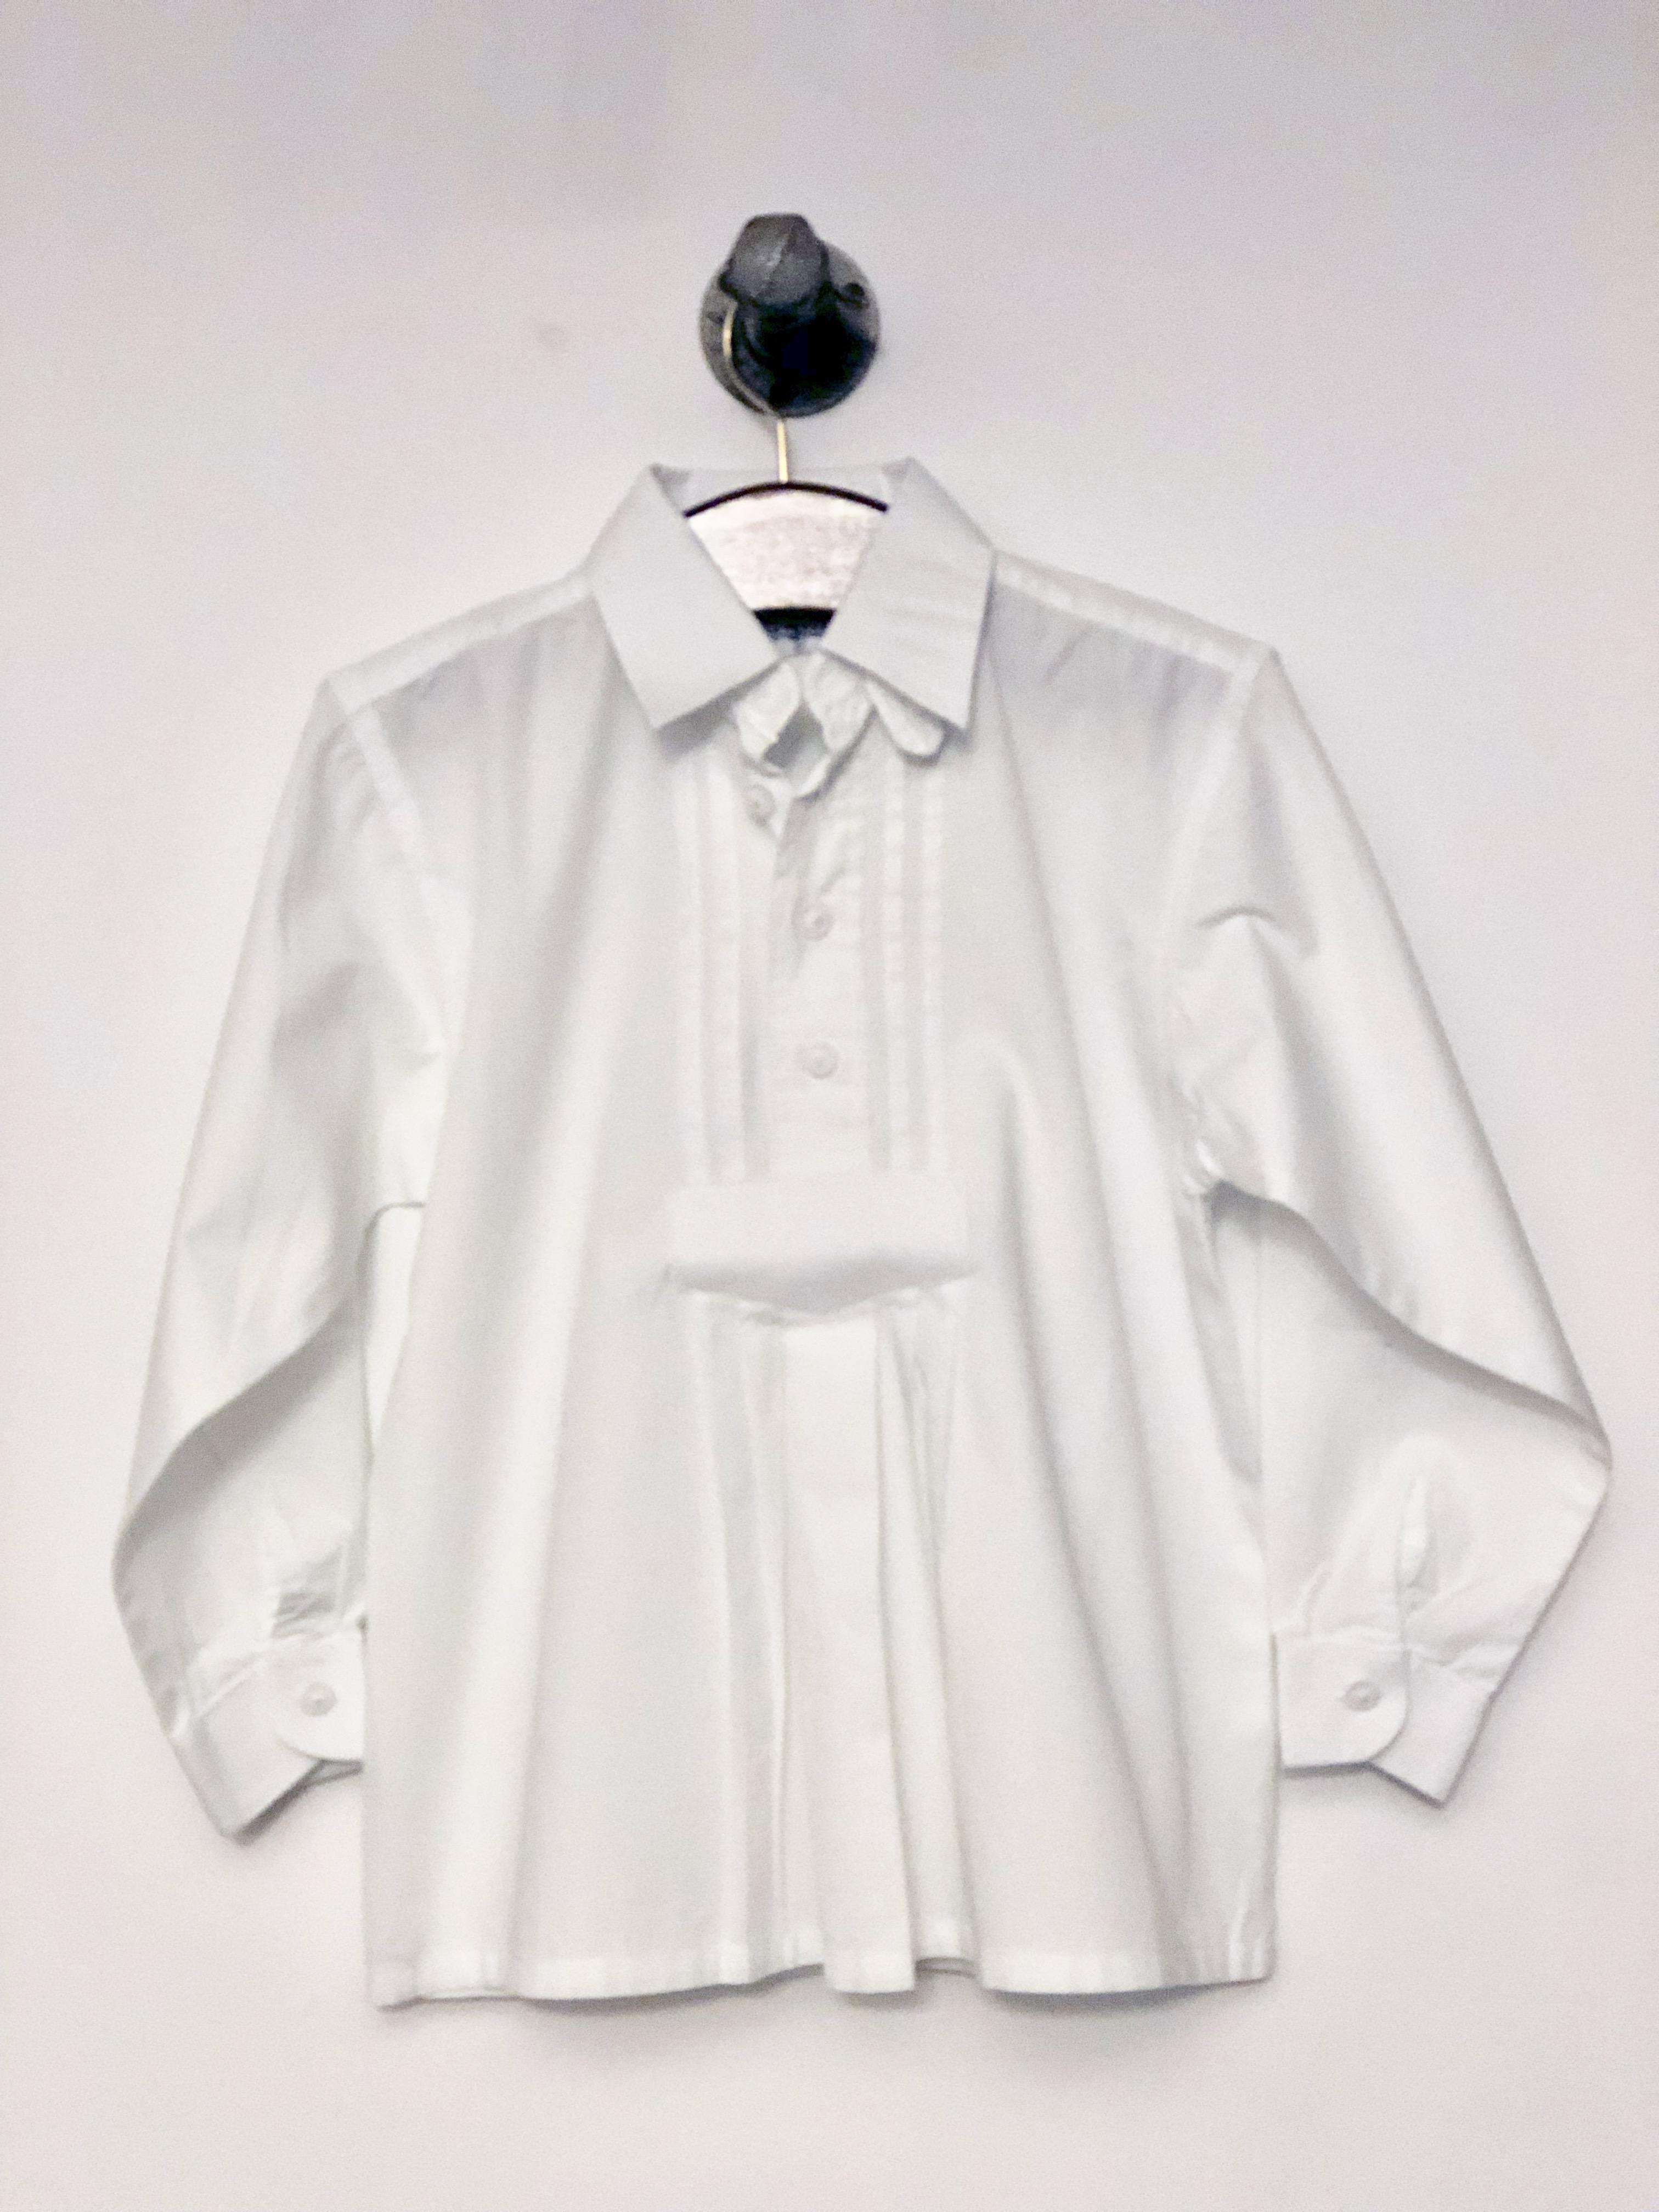 Gr. 128 Isar Trachten Trachtenhemd ok